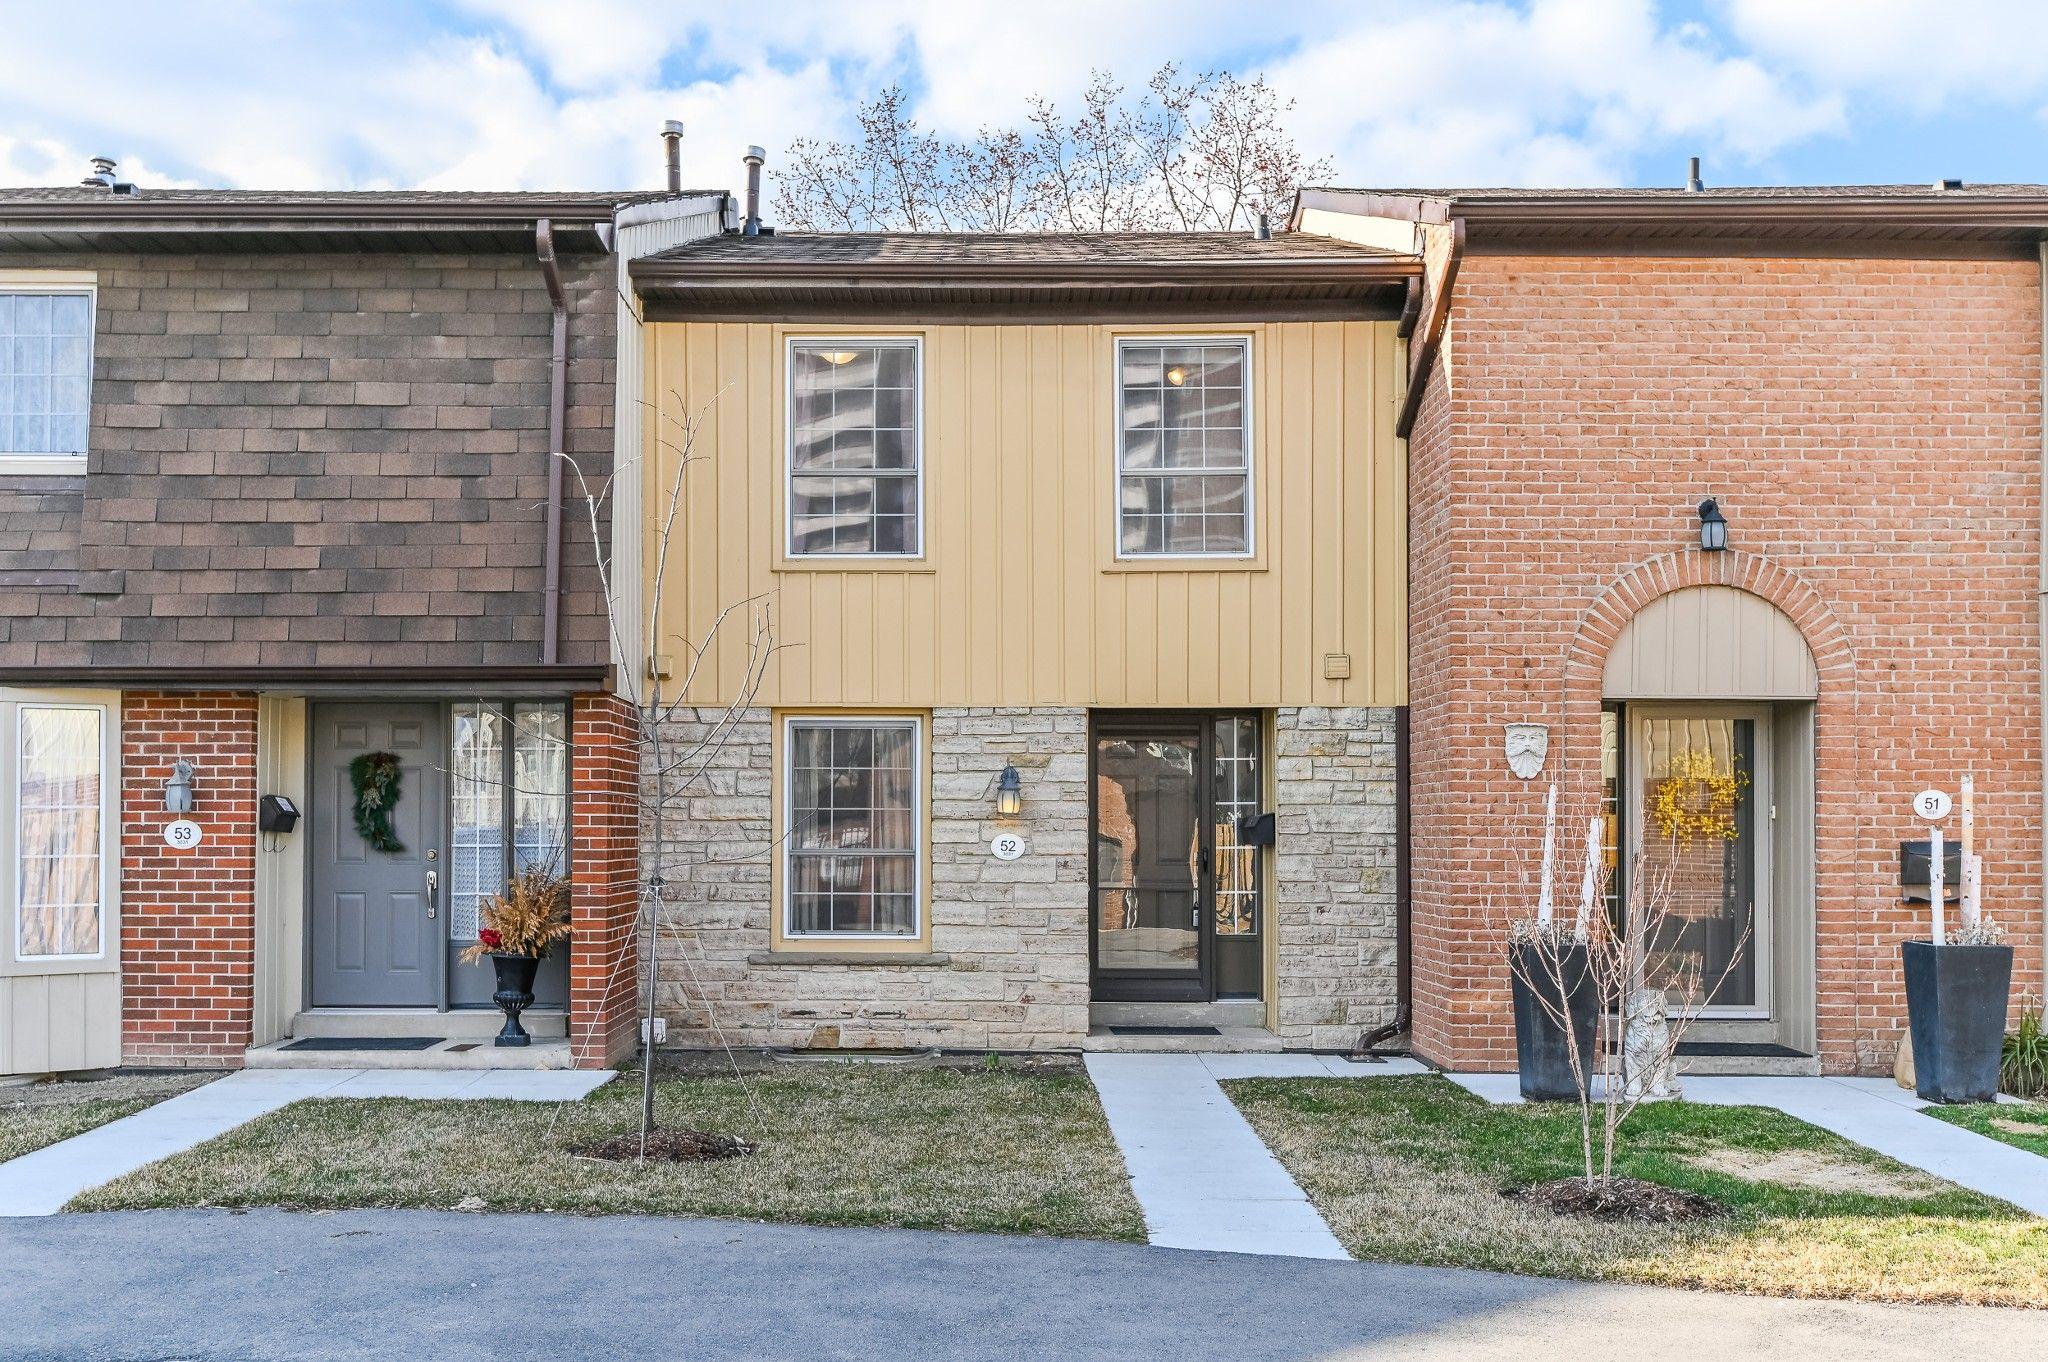 Main Photo: 52 3031 glencrest Road in Burlington: House for sale : MLS®# H4049644